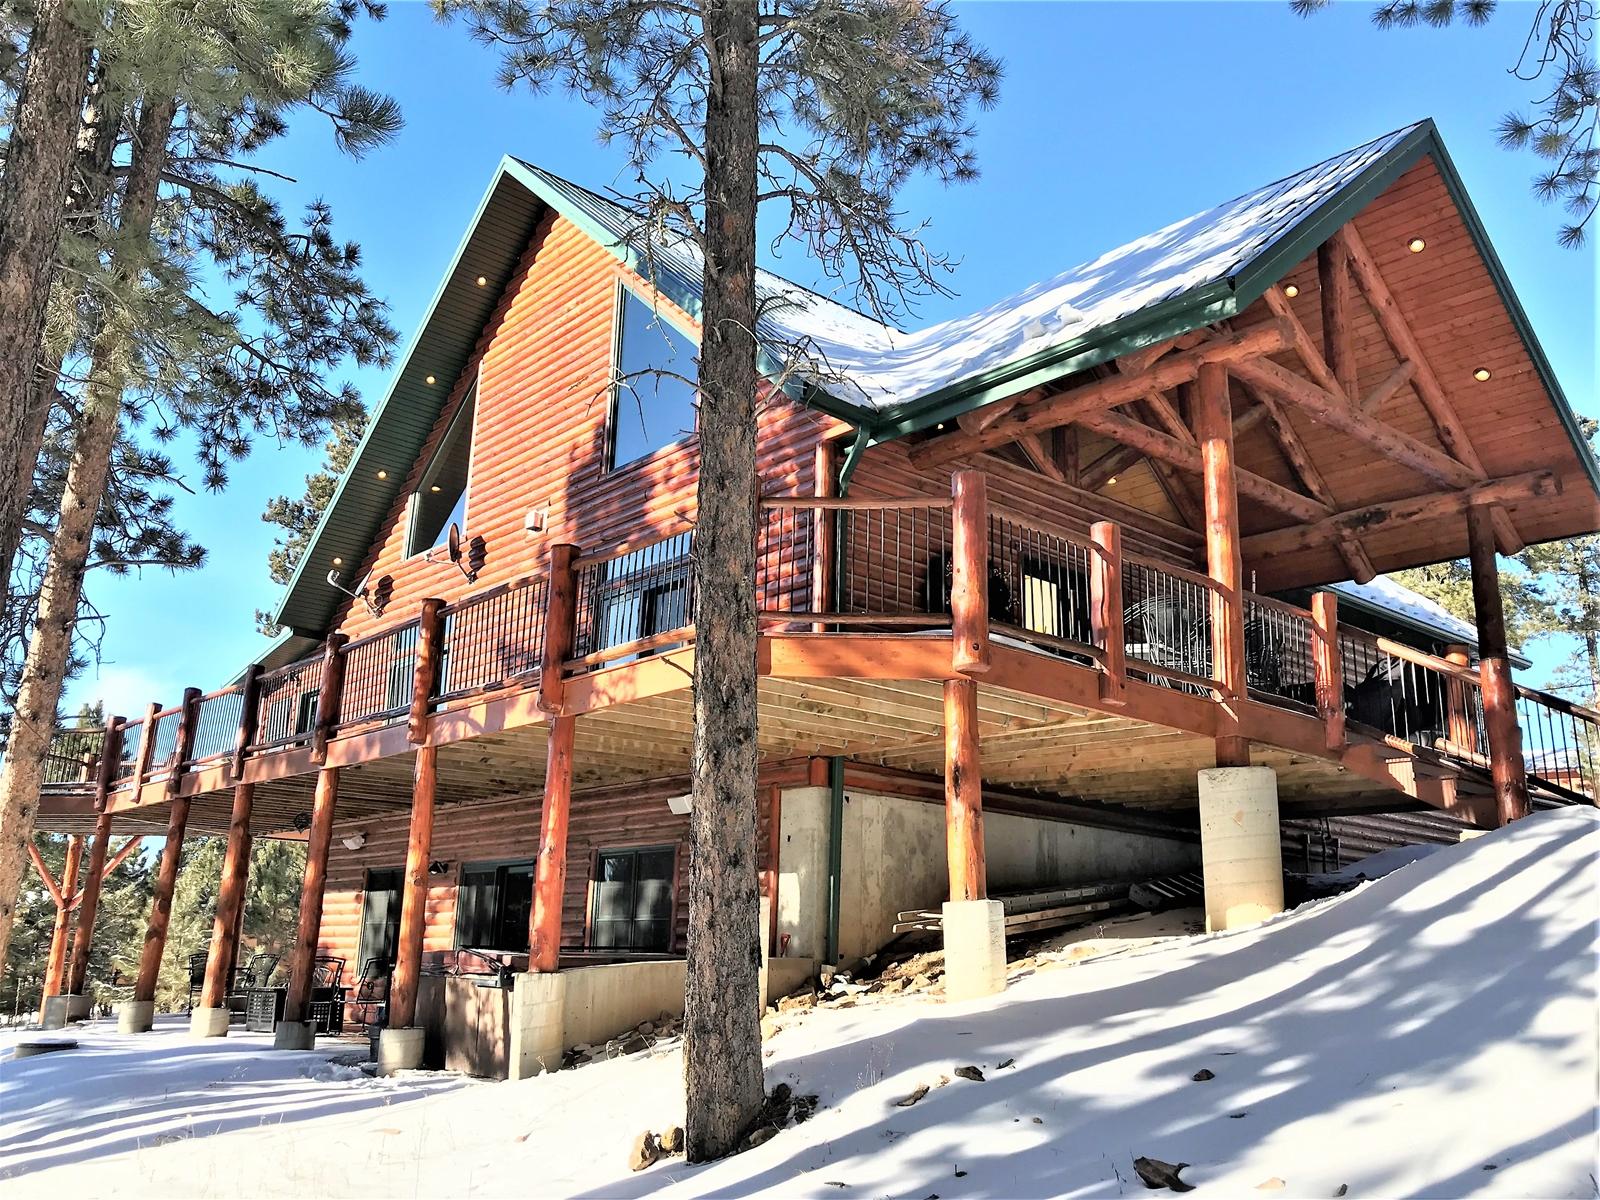 Black Hills Cabin Rentals - Large Groups | Vacation Home Renter